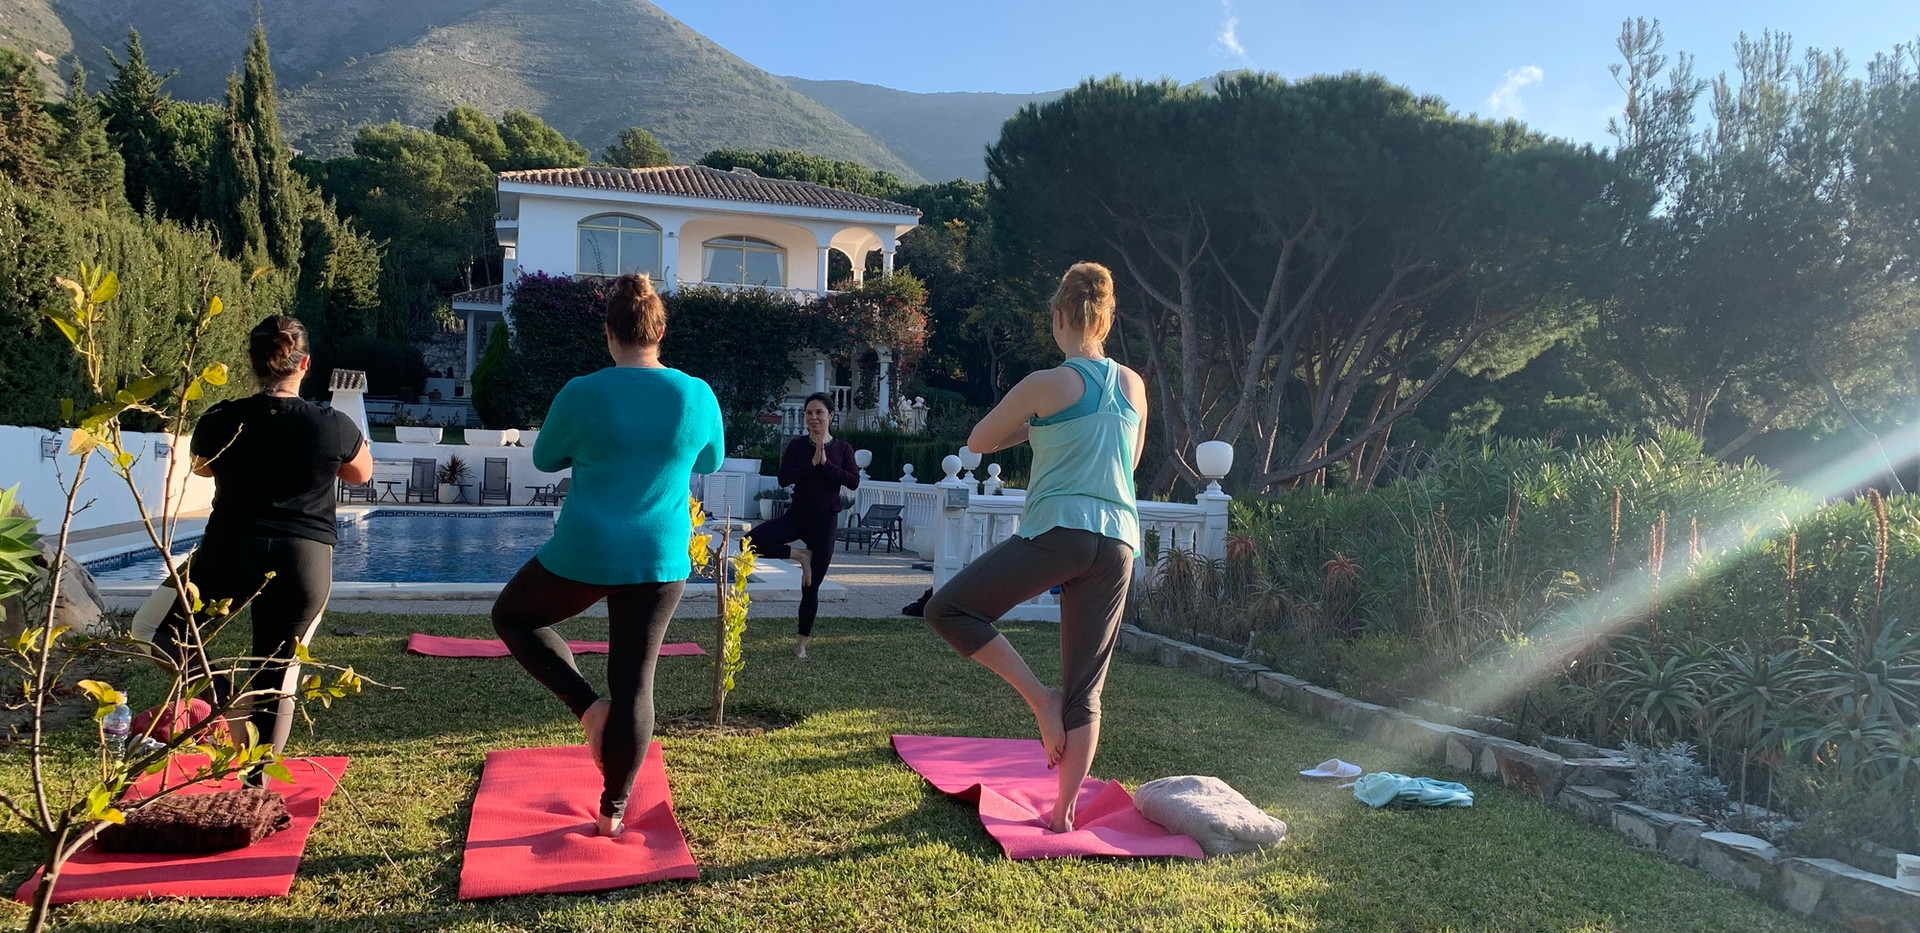 Morning Yoga class at the villa